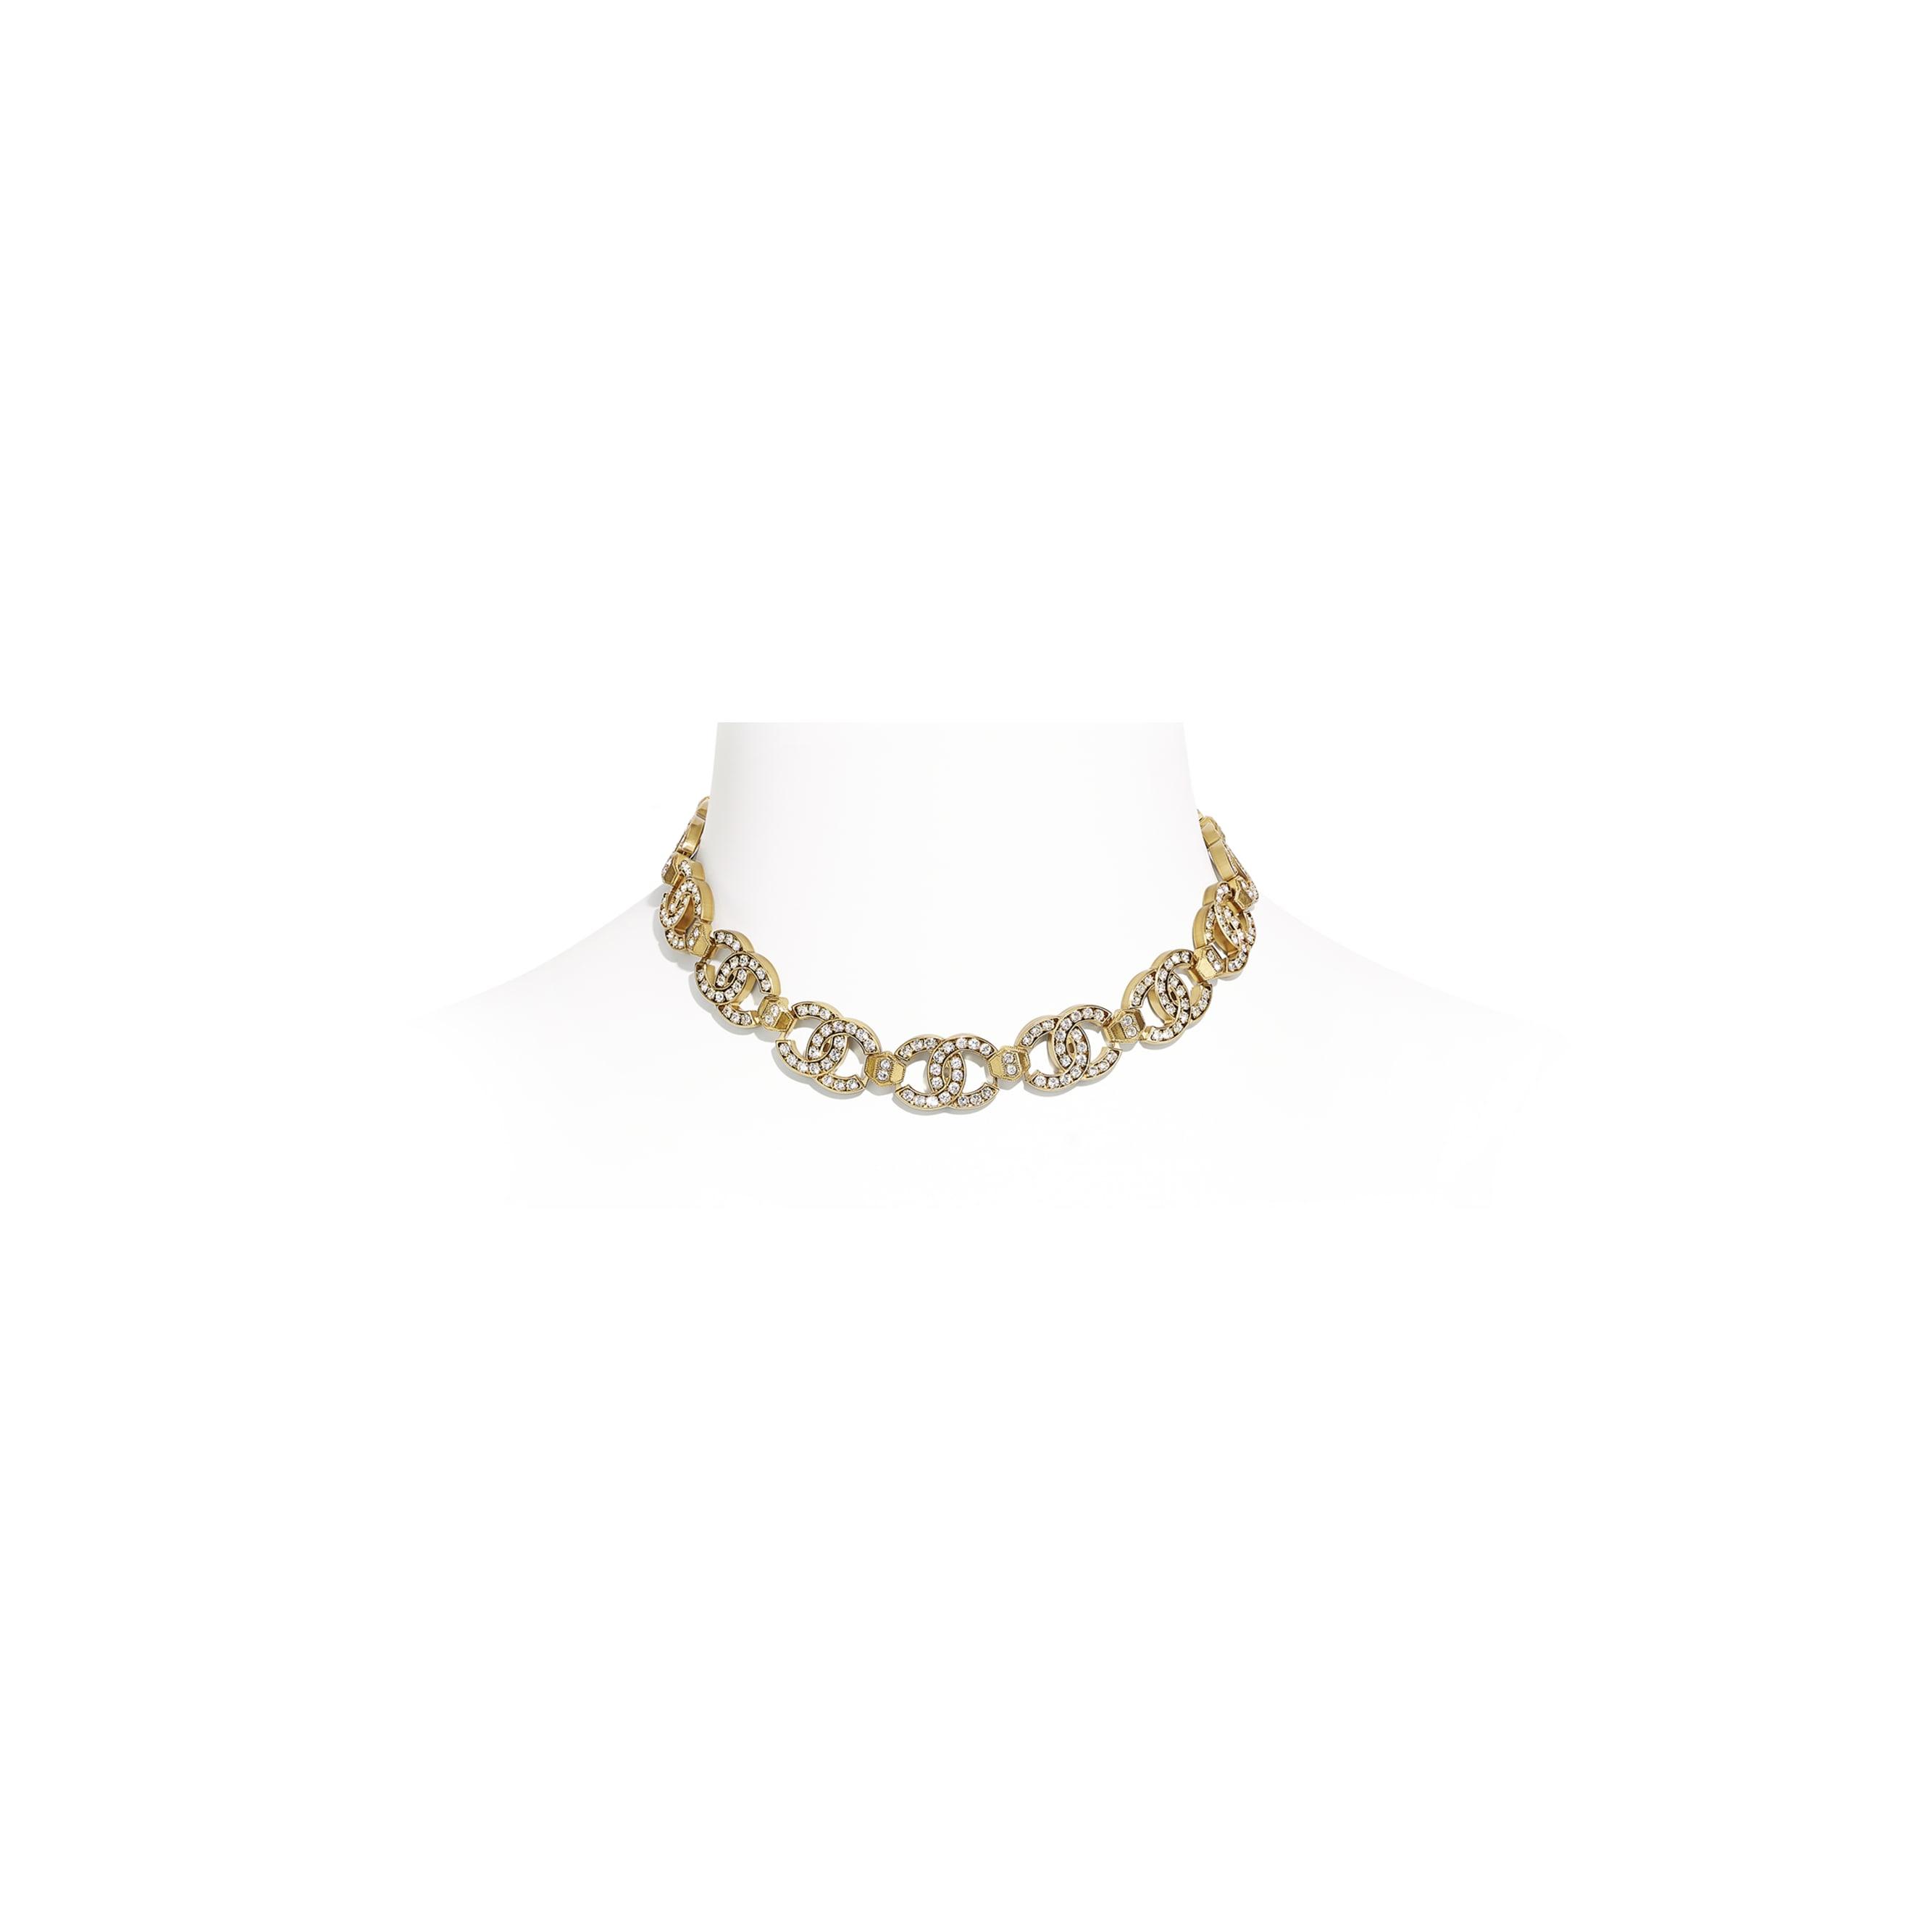 Gargantilha - Gold & Crystal - Metal & Strass - CHANEL - Vista predefinida - ver a versão em tamanho standard